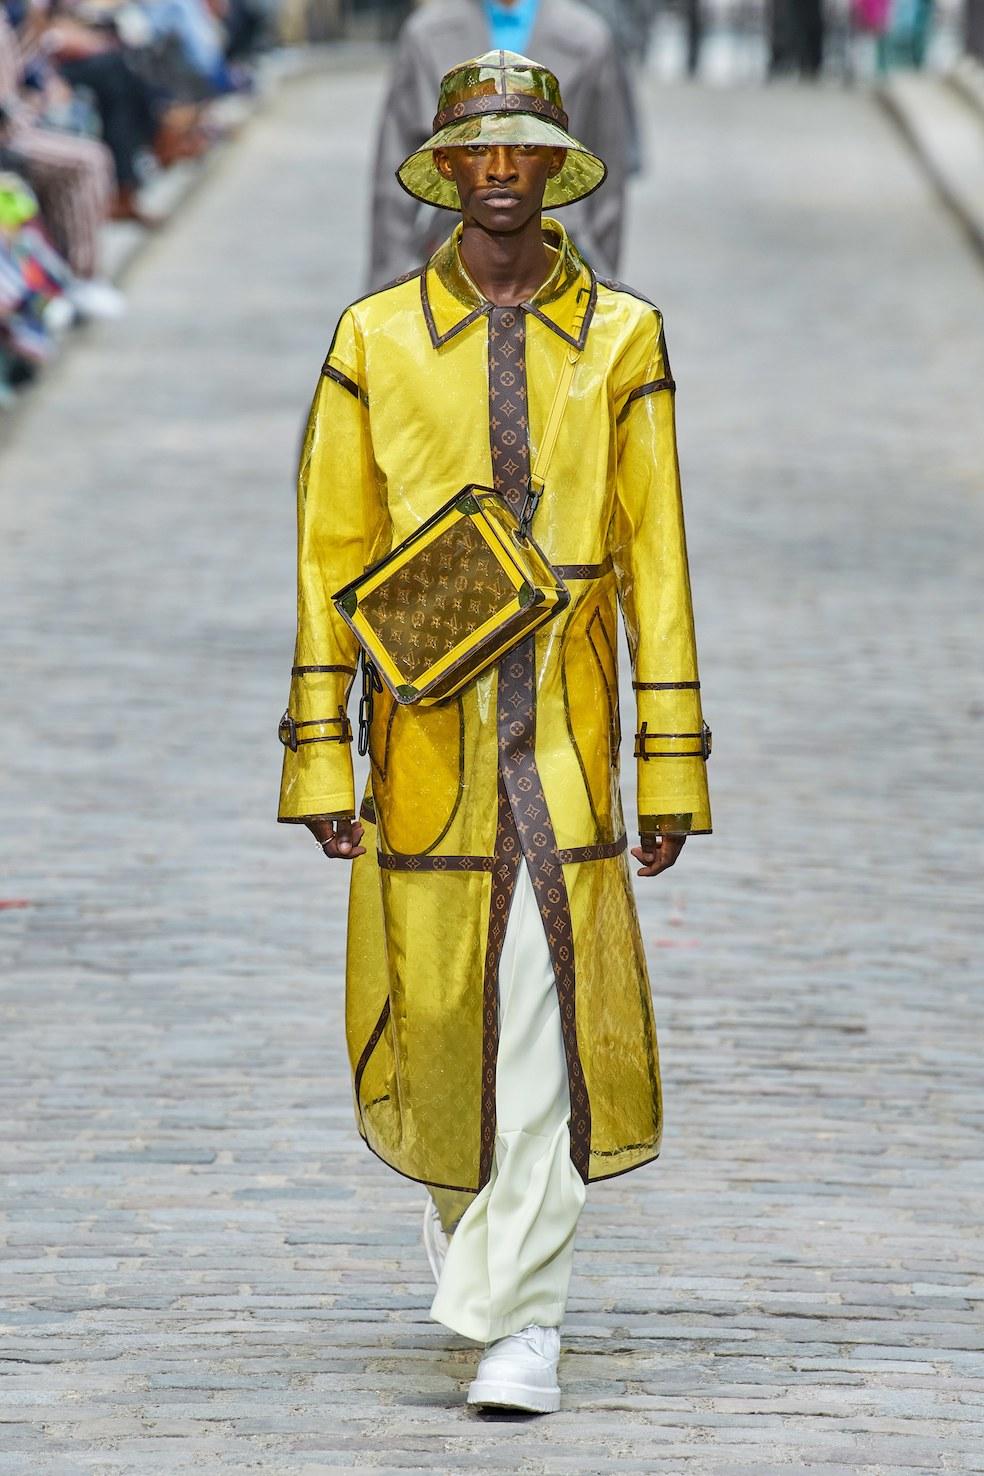 Louis_Vuitton_SS20_Behind_The_Blinds_Magazine__FIO0383.jpg